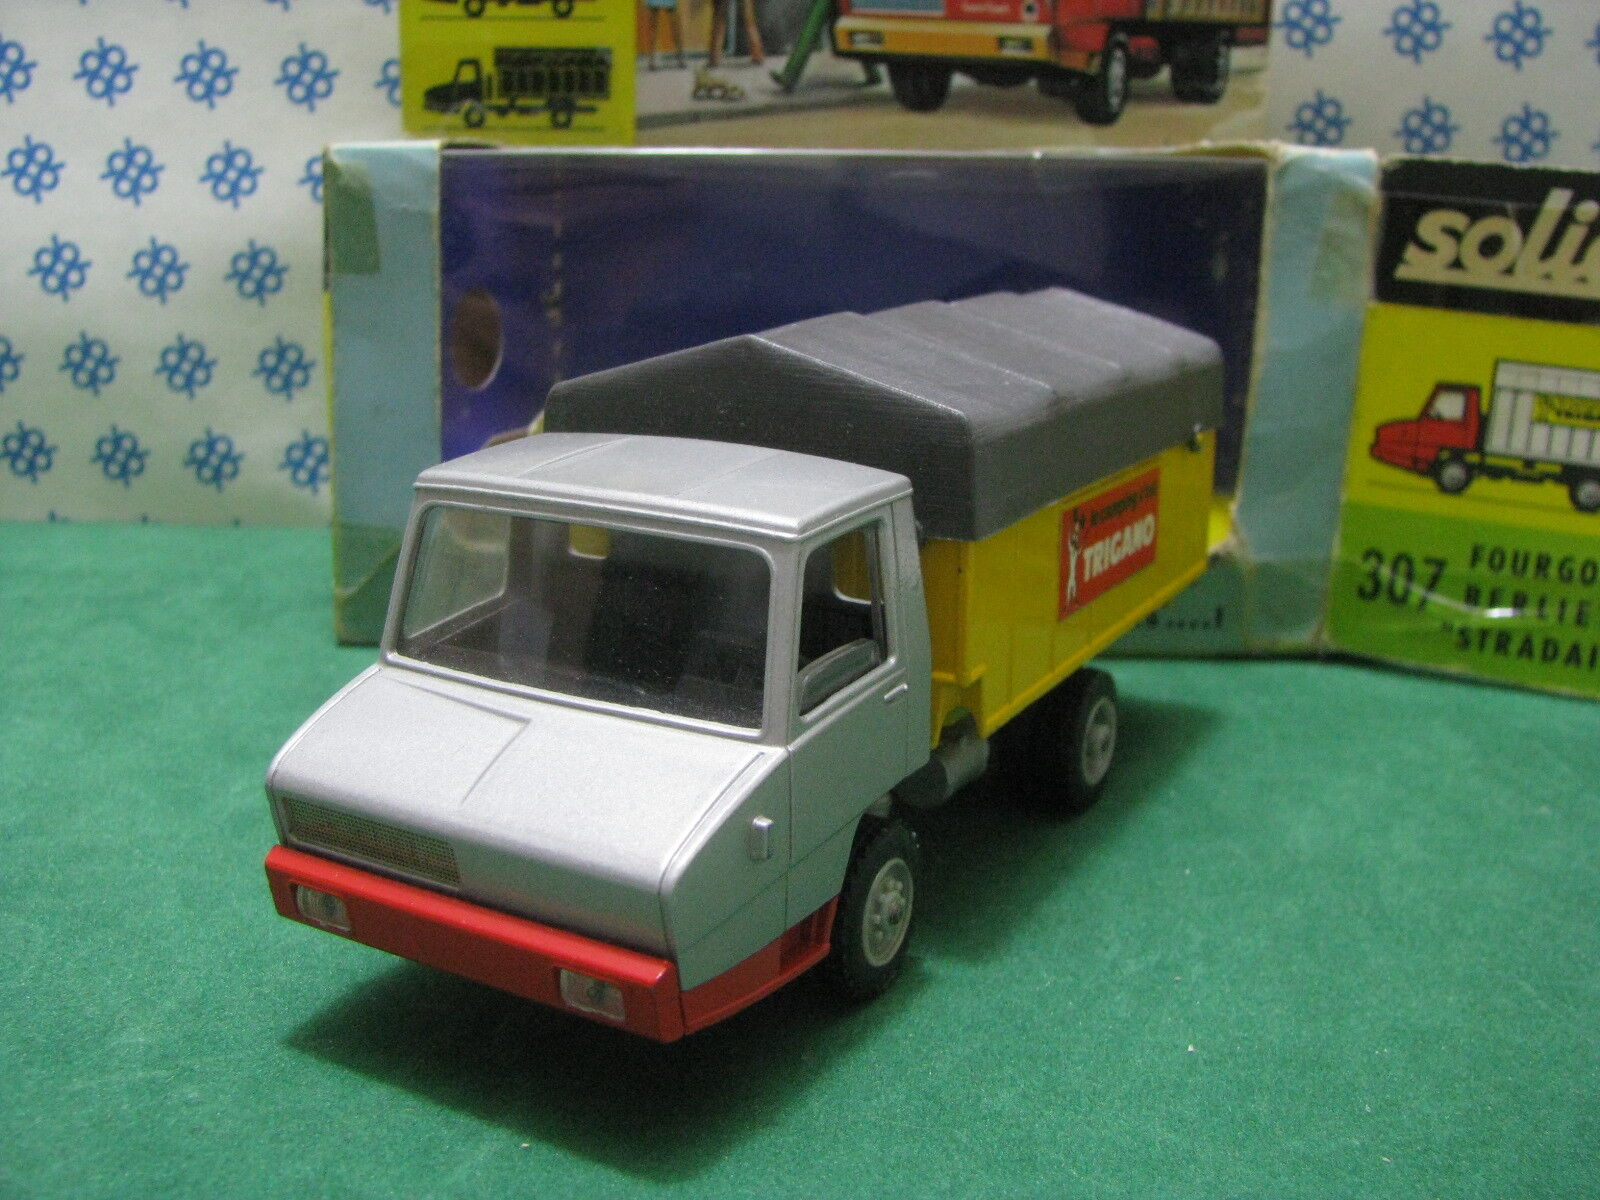 Estremely Rare - FOURGON BERLIET   Stradair   - 1/50 Solido Ref. 307 MIB